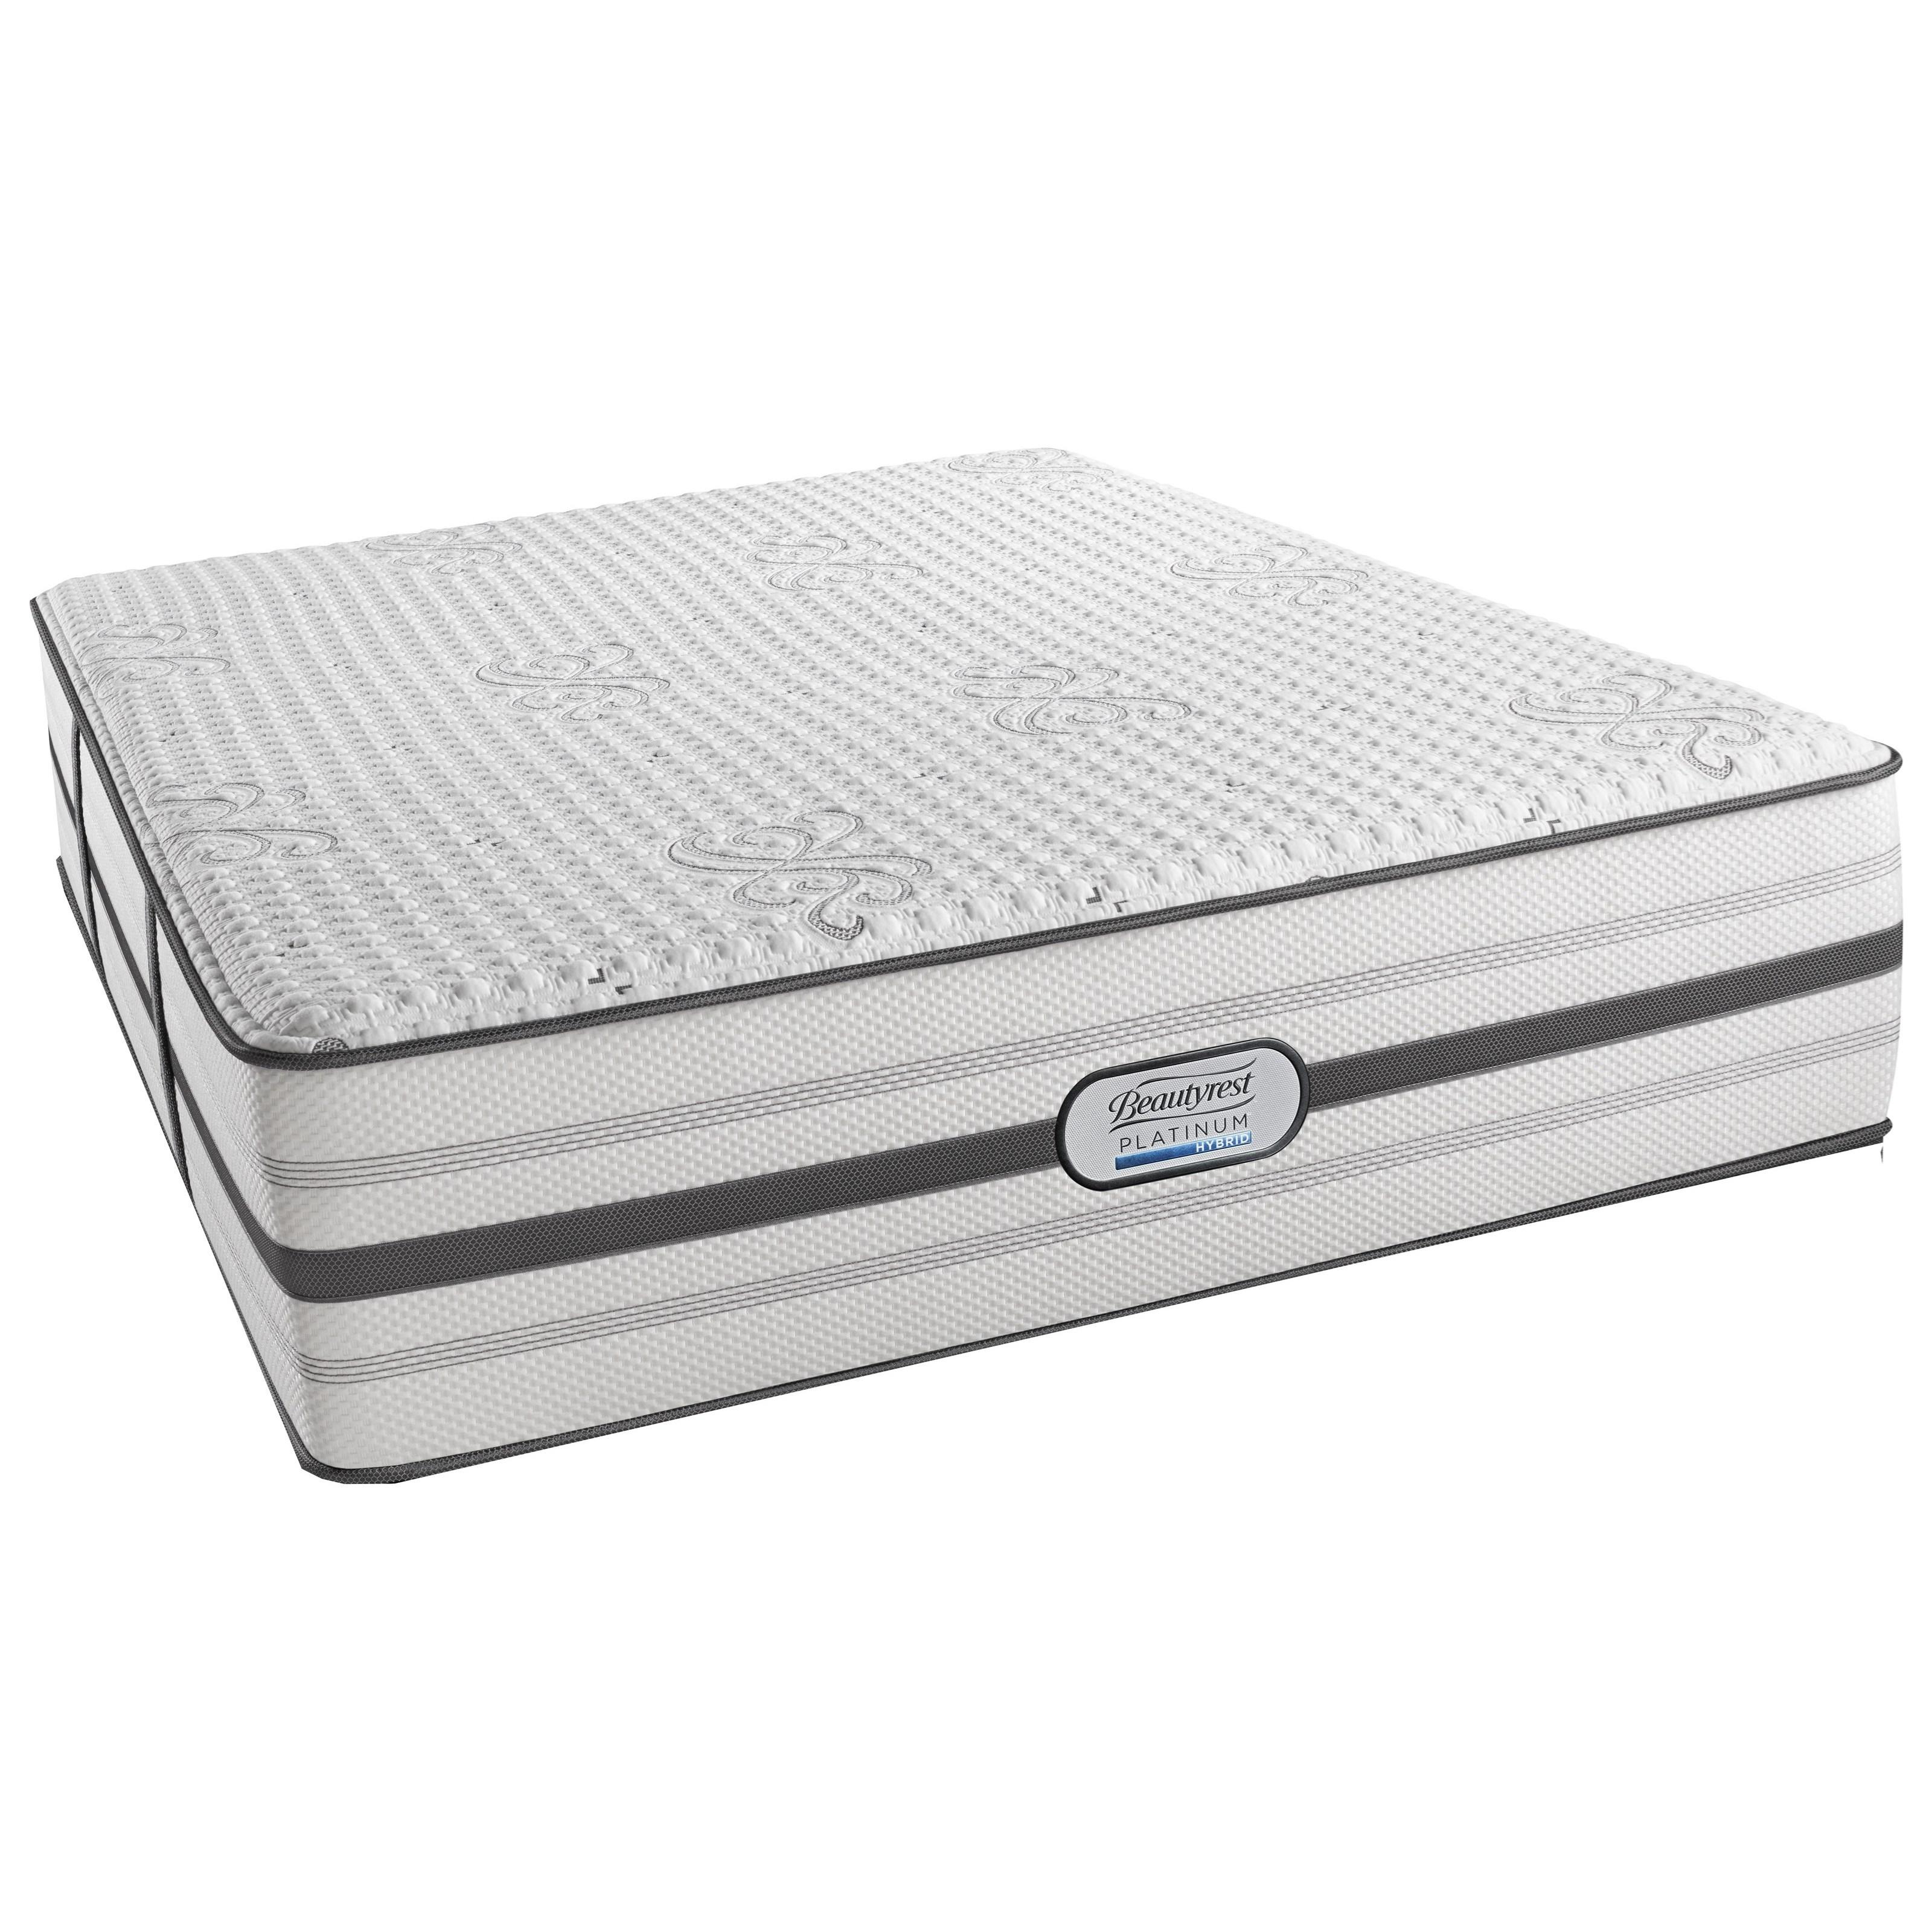 Beautyrest Platinum Hybrid Quinn Cal King Ultra Plush Adjustable Set - Item Number: BRHLV4UPL-CK+2xSM1-SPCK